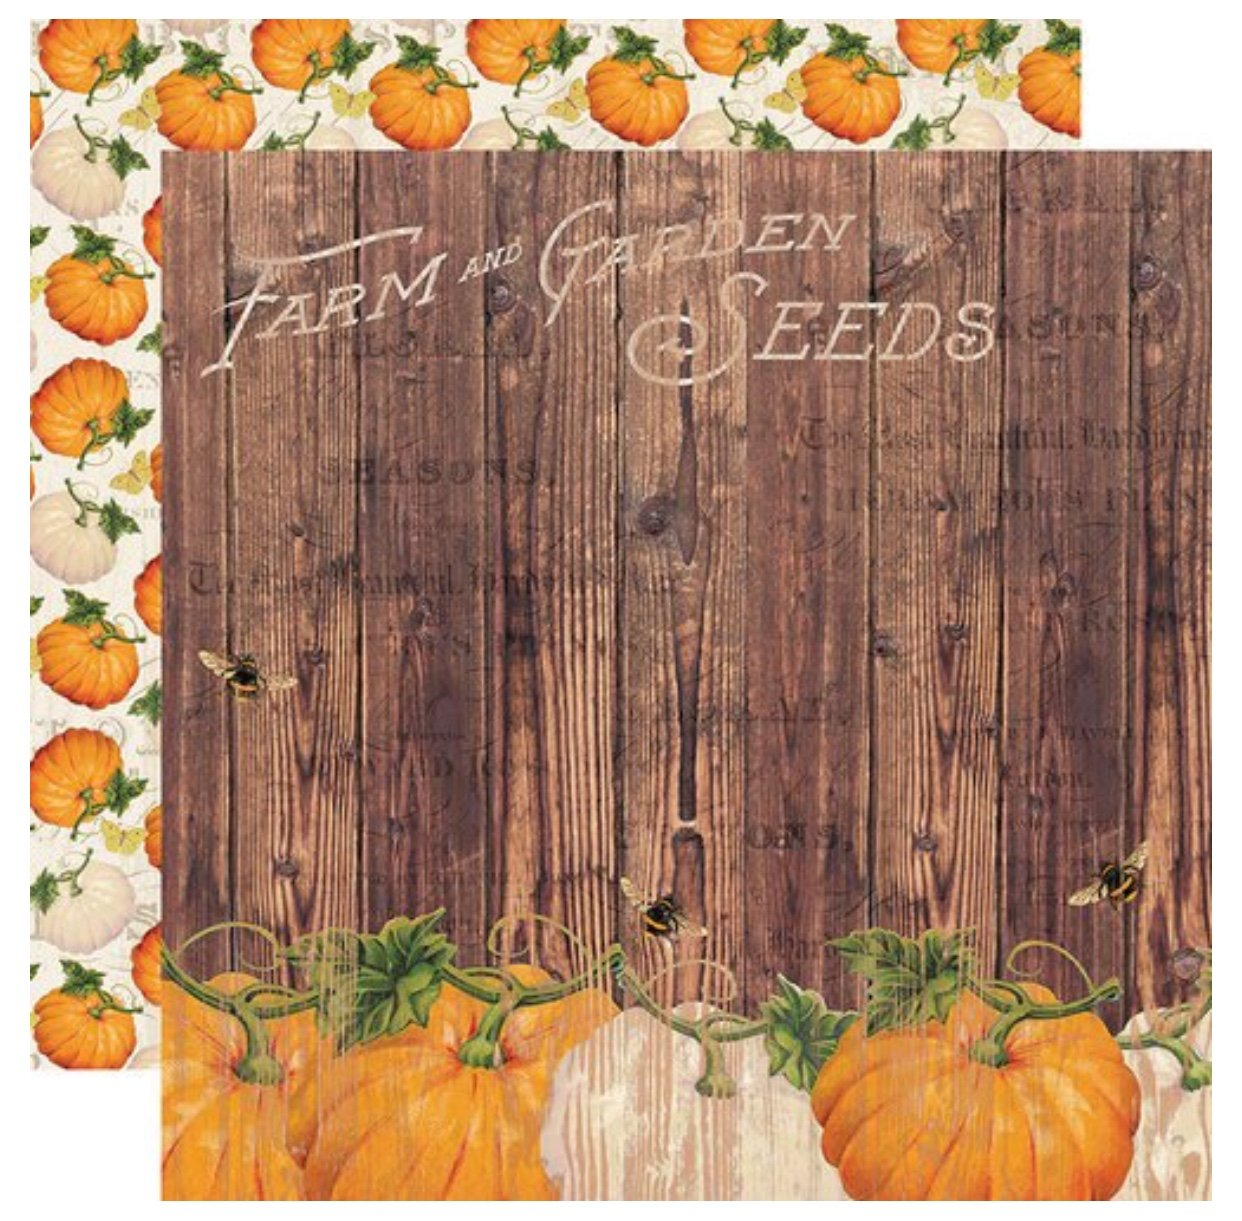 Simple Stories Autumn Splendor Double-Sided Cardstock 12X12 Harvest Memories